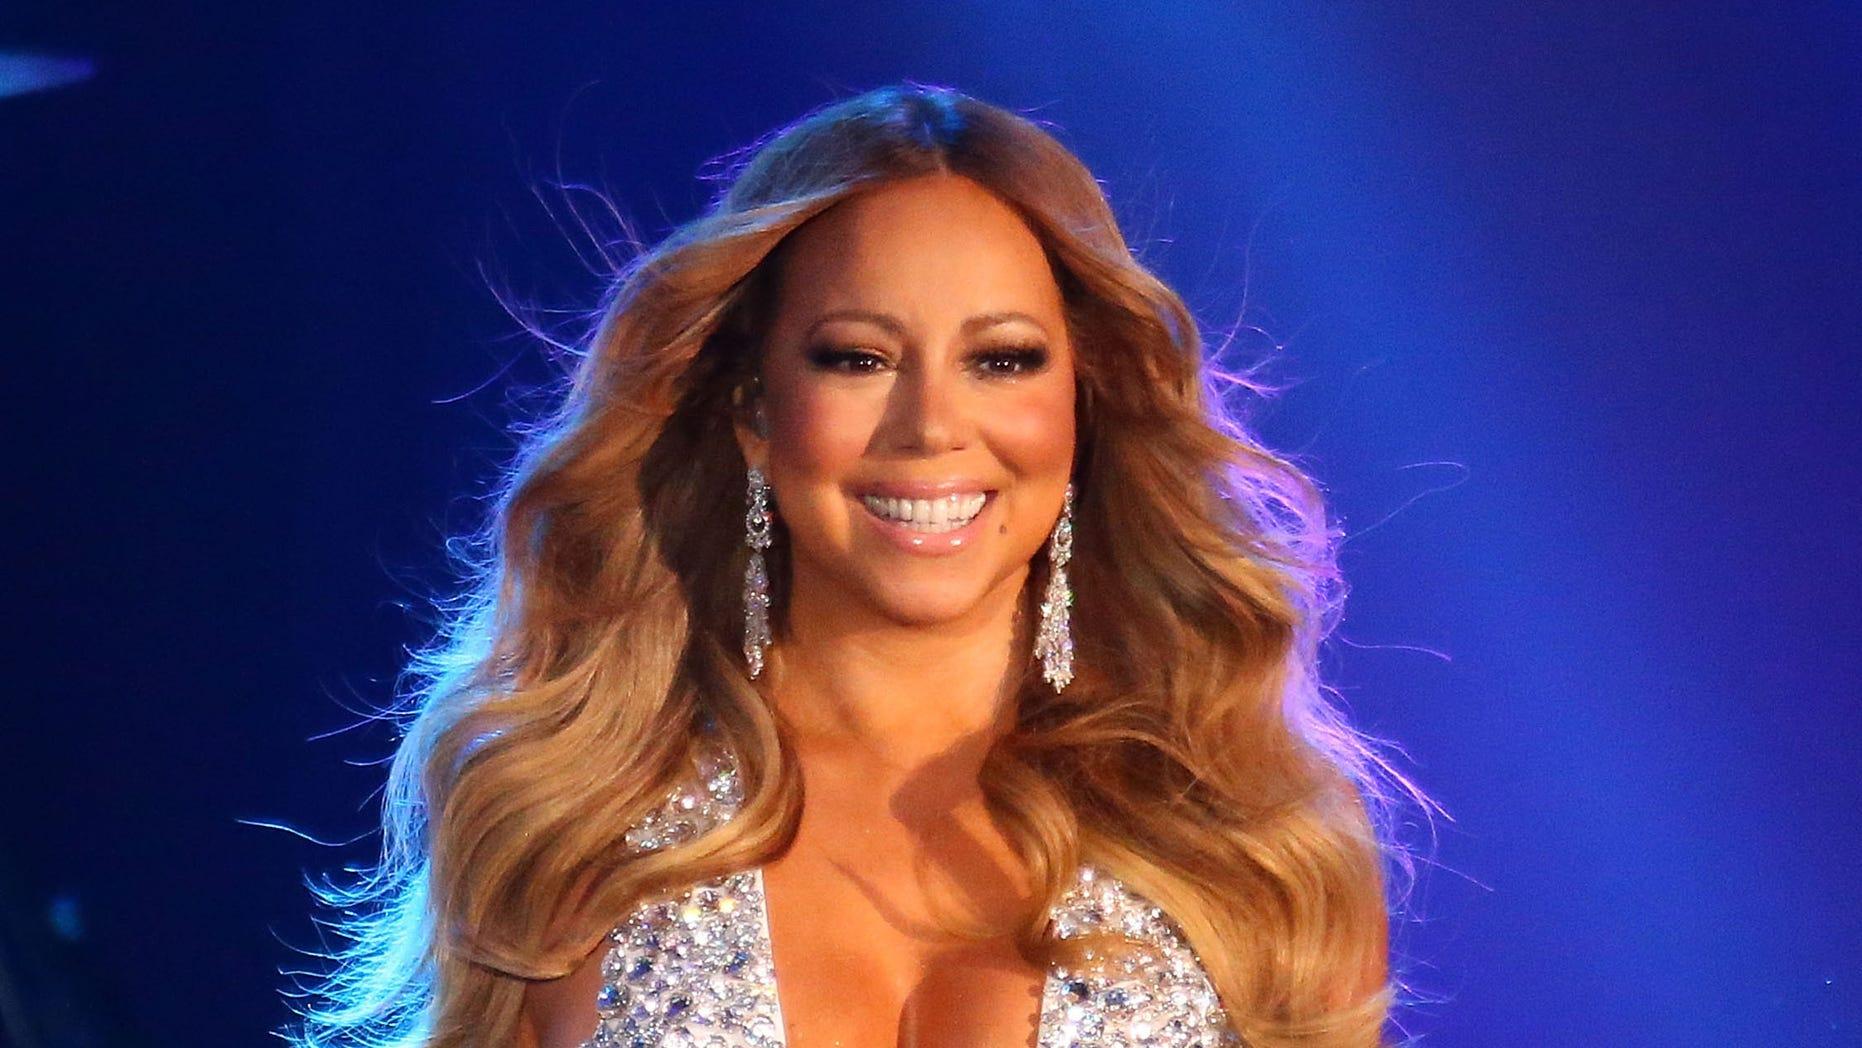 Mariah Carey on December 31, 2015 in Melbourne, Australia.